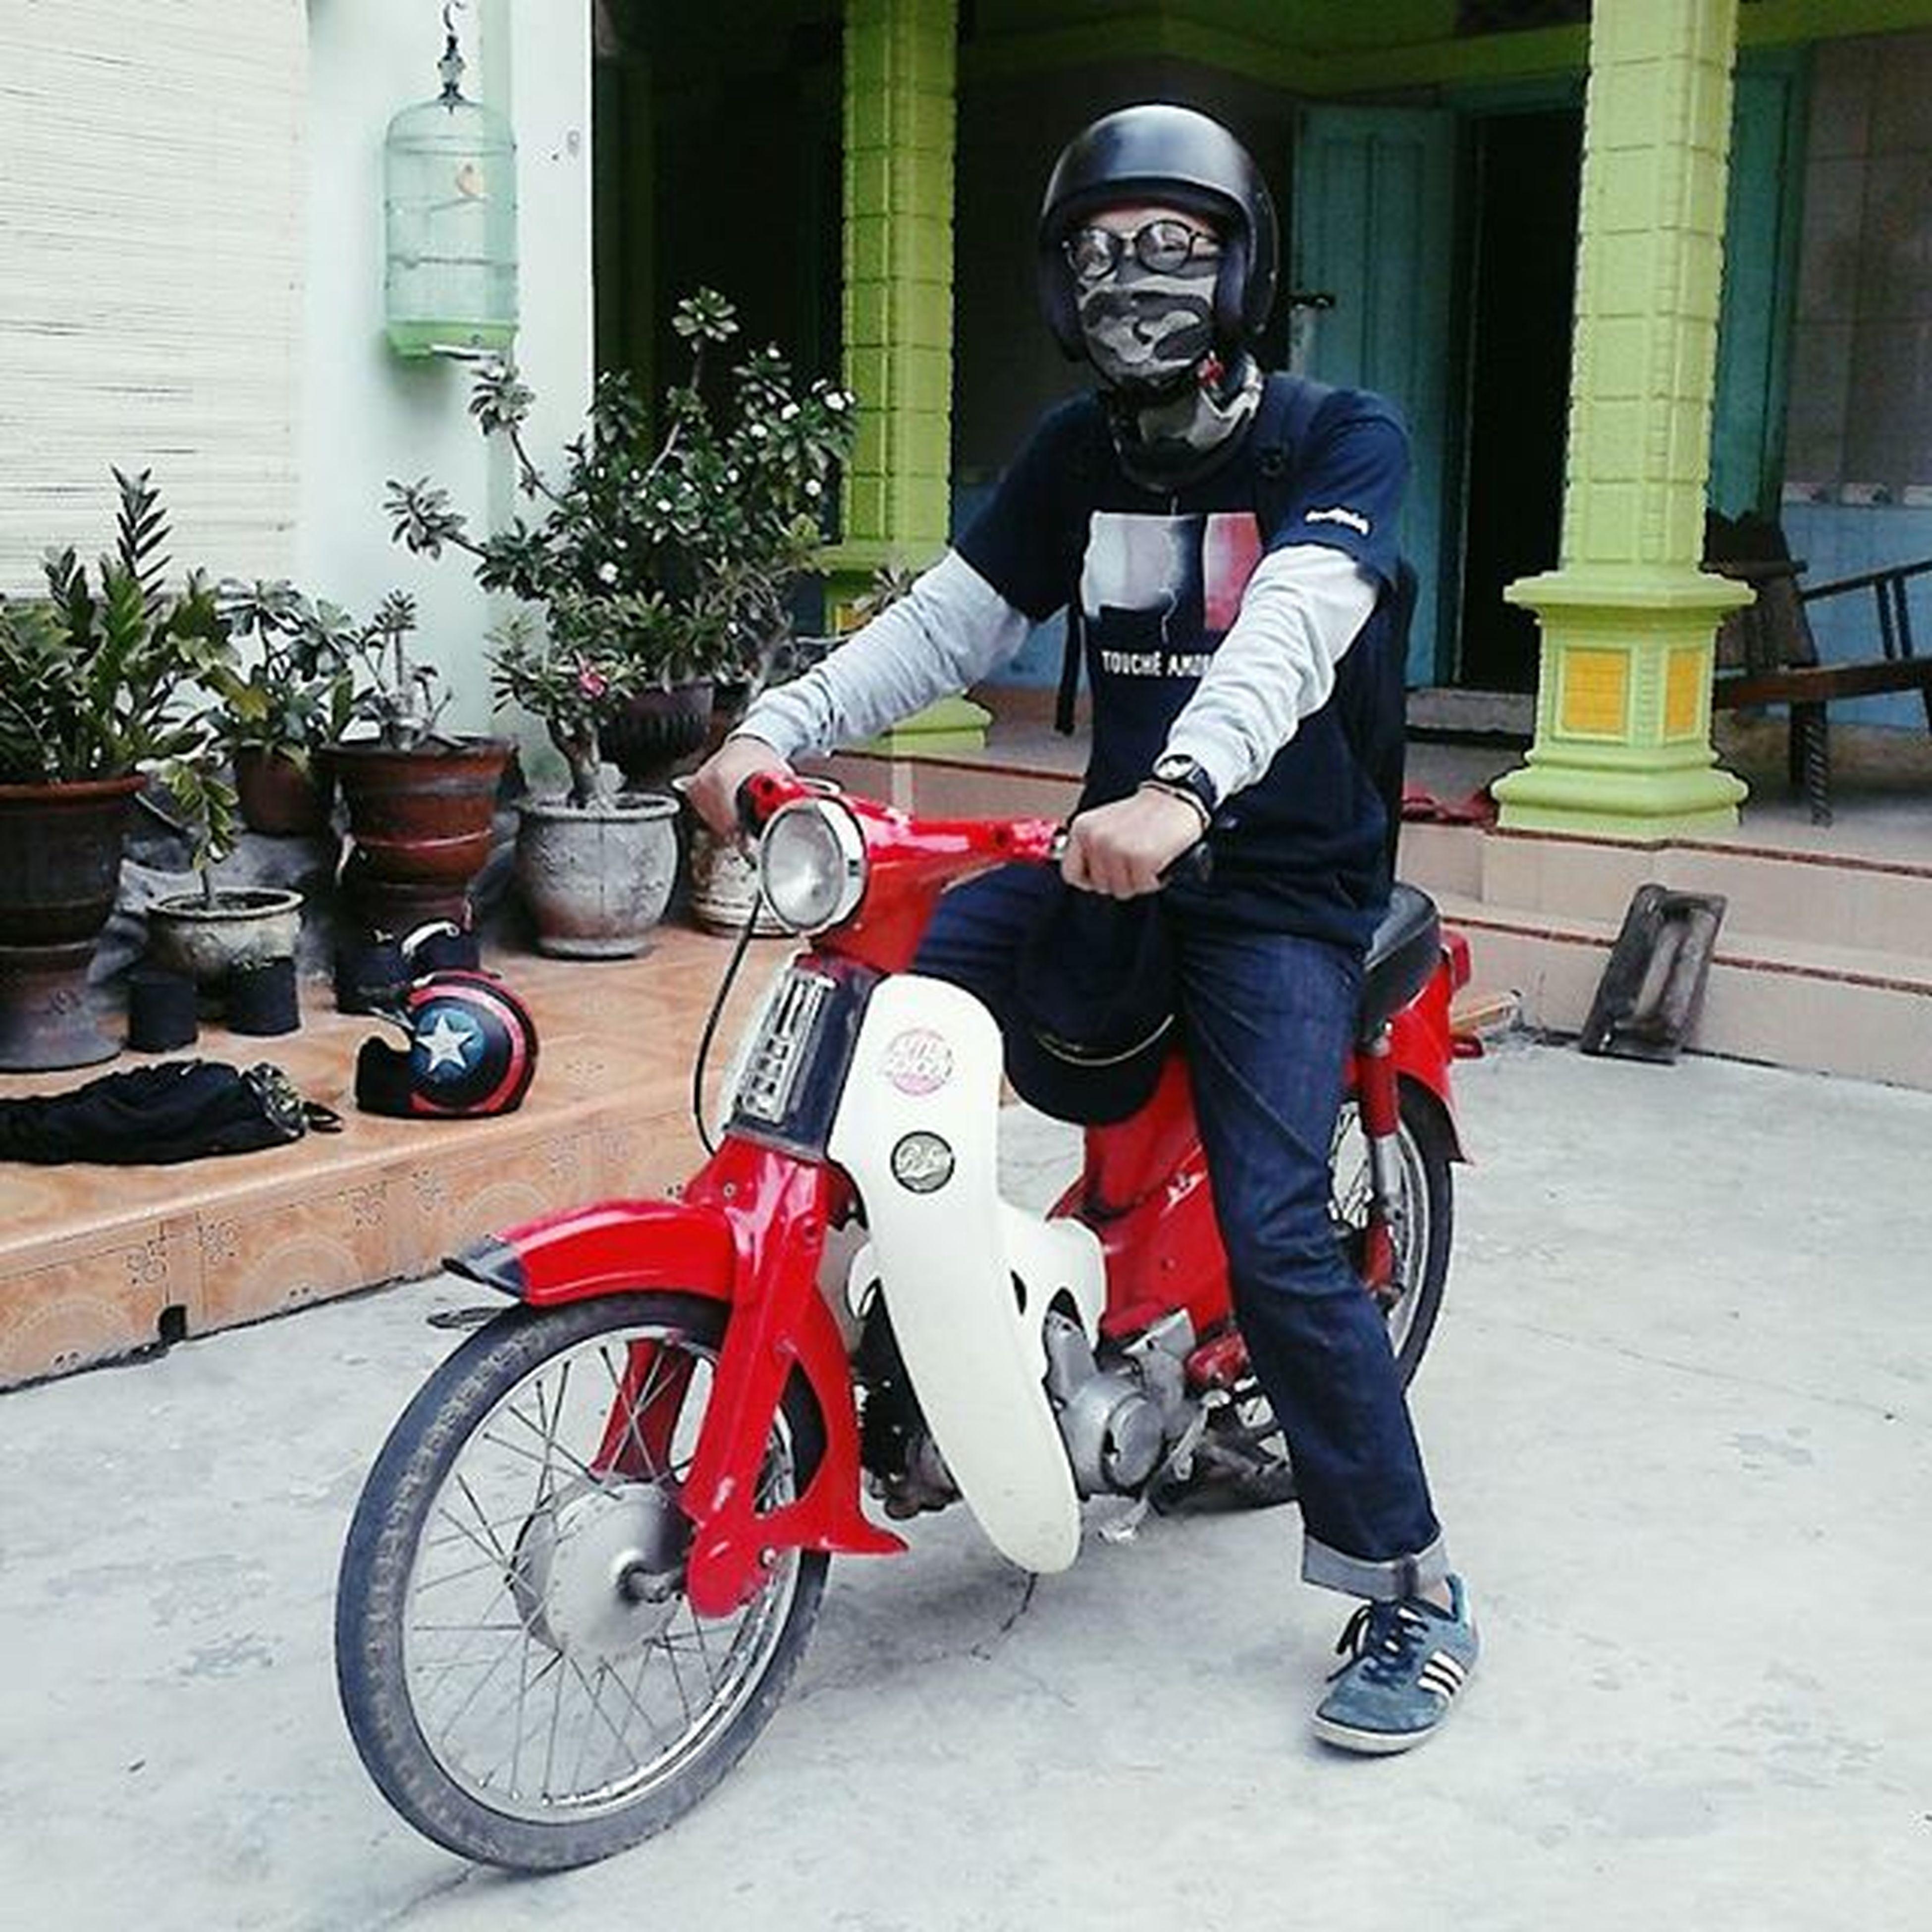 sini bonceng abang dek :3 . . . . . . Sekepalaspal Bikertermenung Bike Vscocam VSCO TBT  Biker Swengskoy Selamanyaduaroda